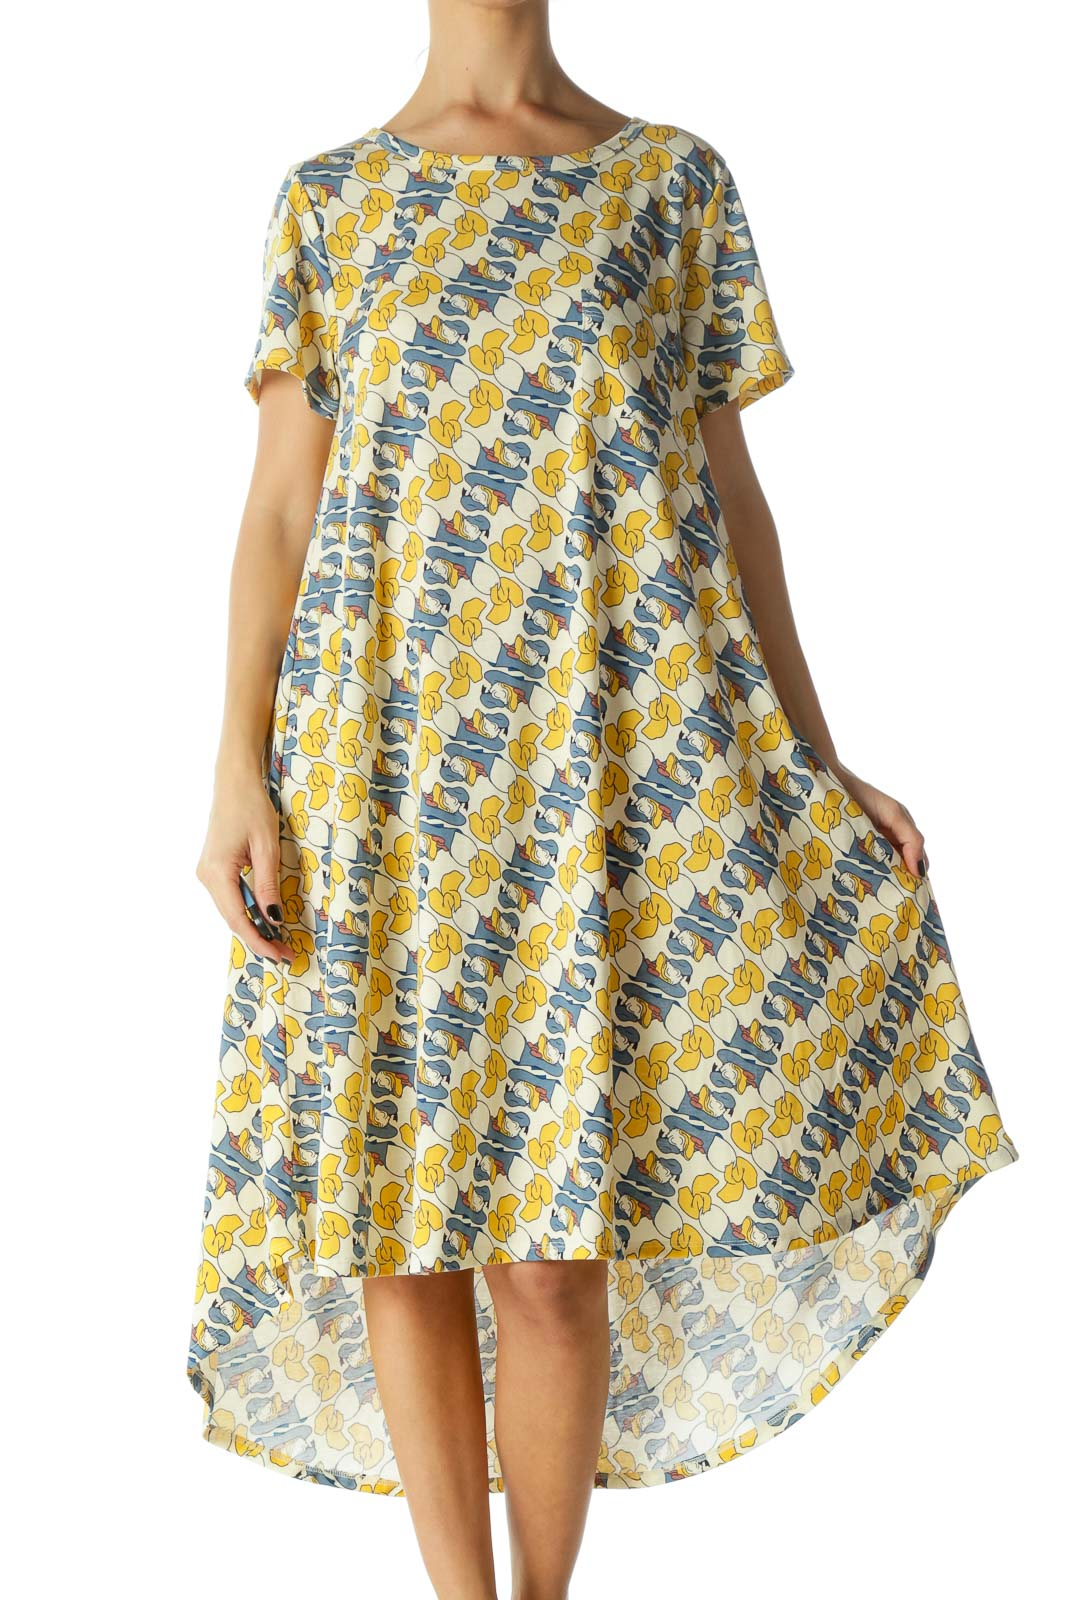 Yellow and Blue Donald Duck Print Short Sleeve Shirt Dress Front